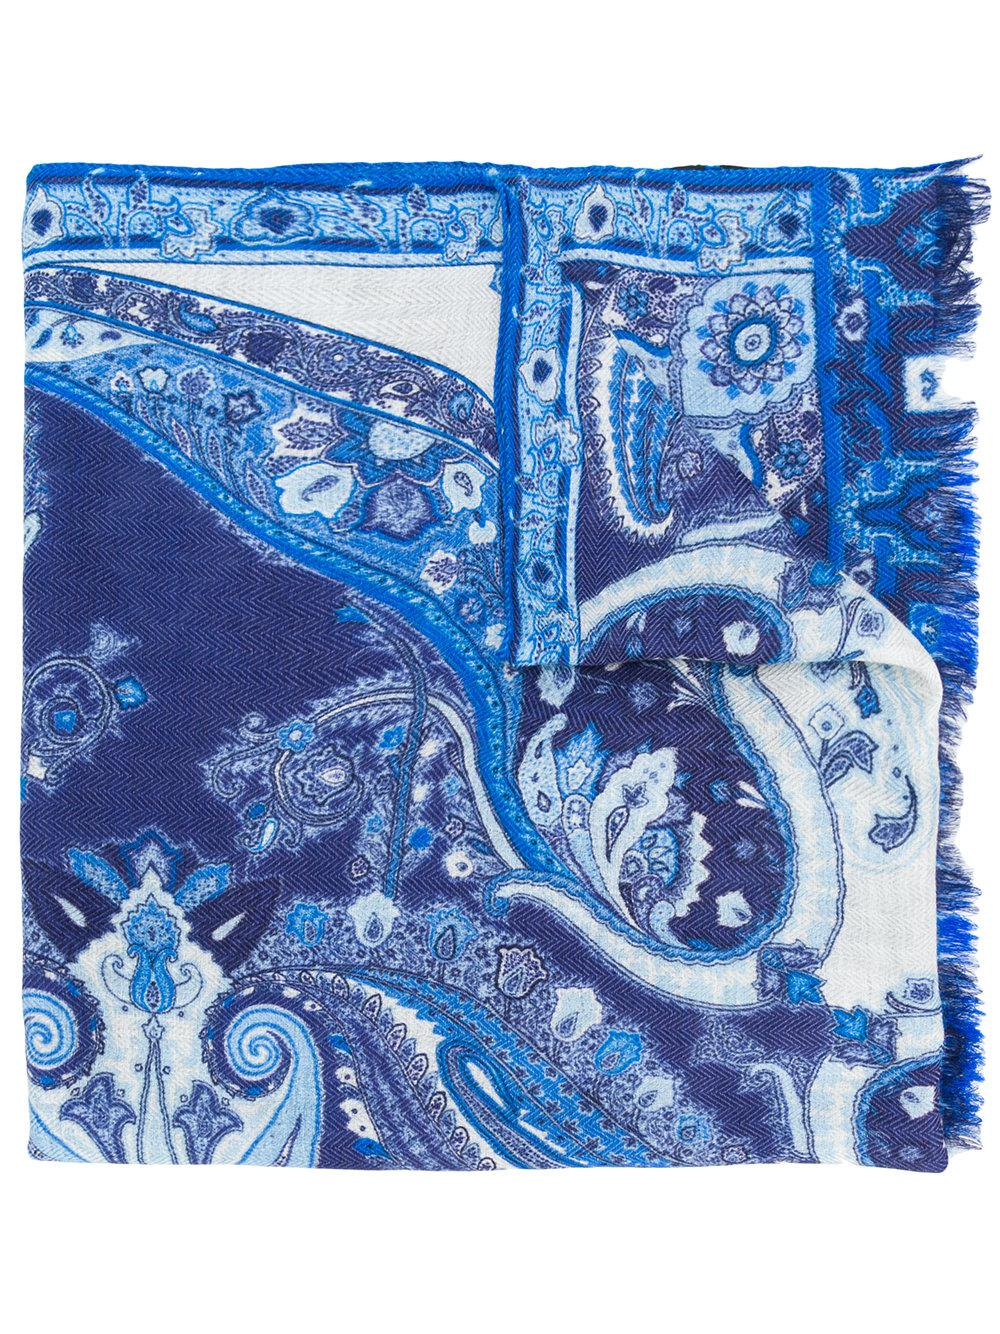 Etro Mixed Print Scarf - Blue